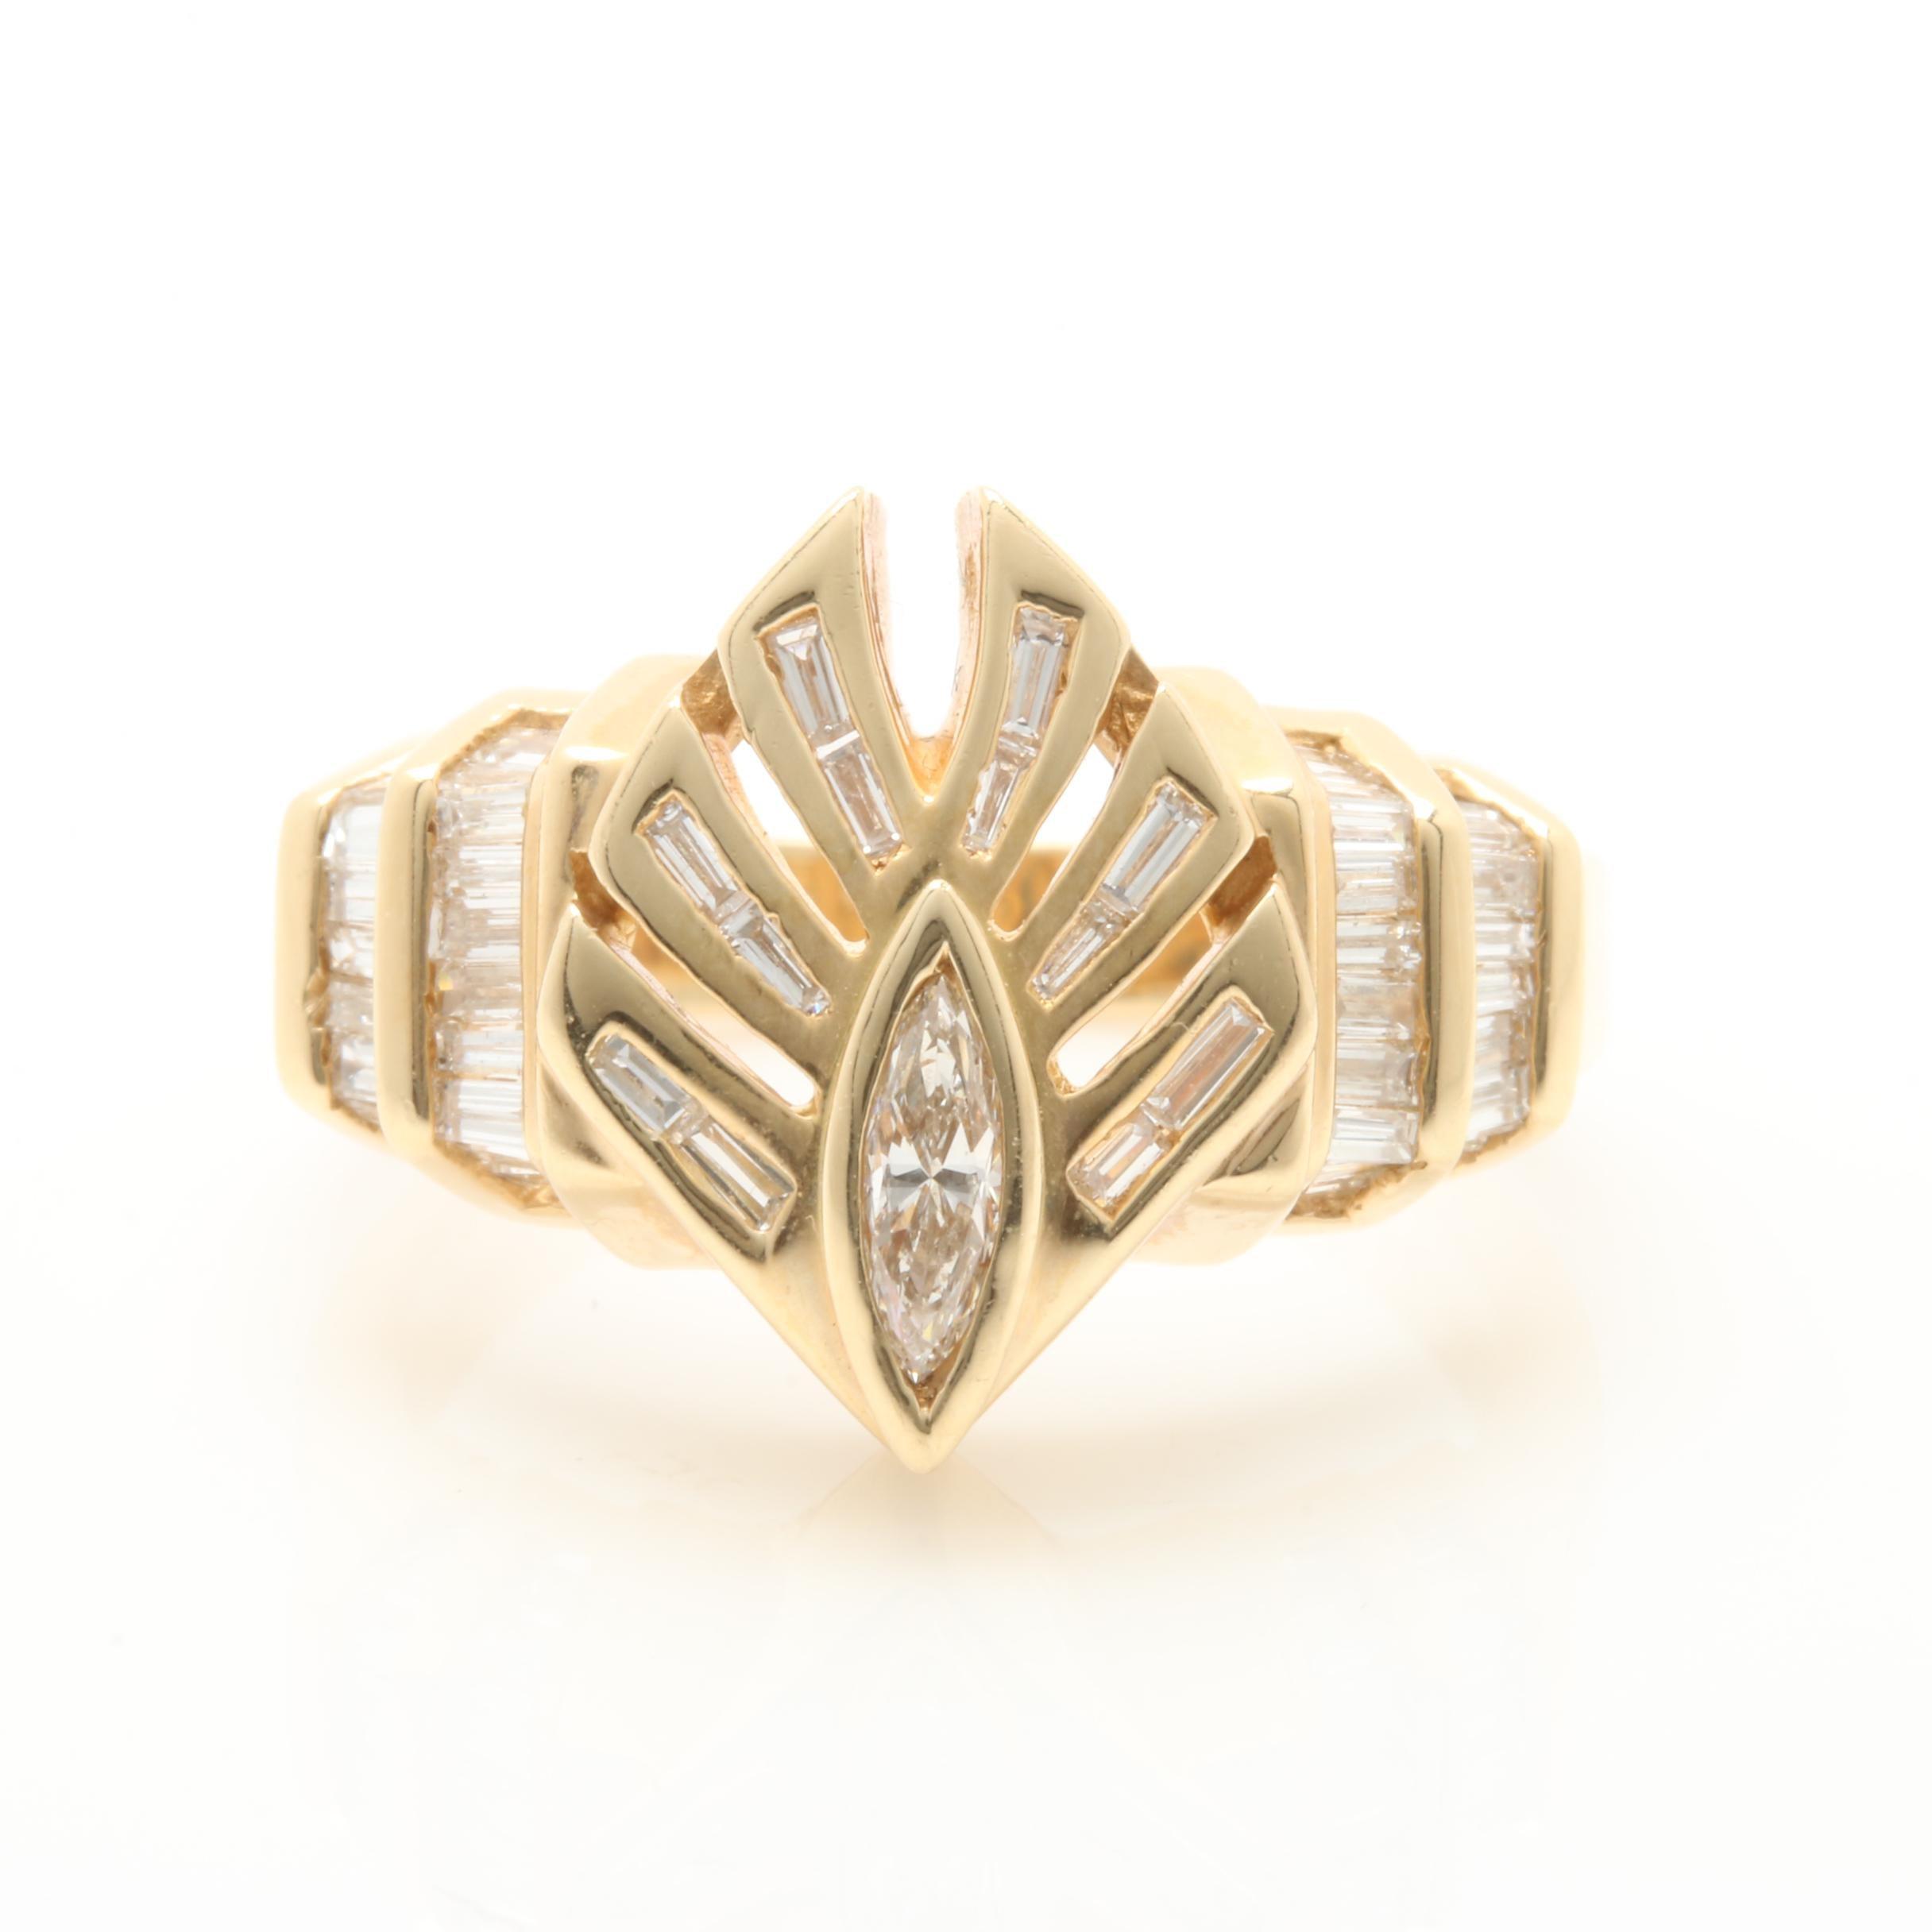 14K Yellow Gold 1.16 CTW Diamond Ring